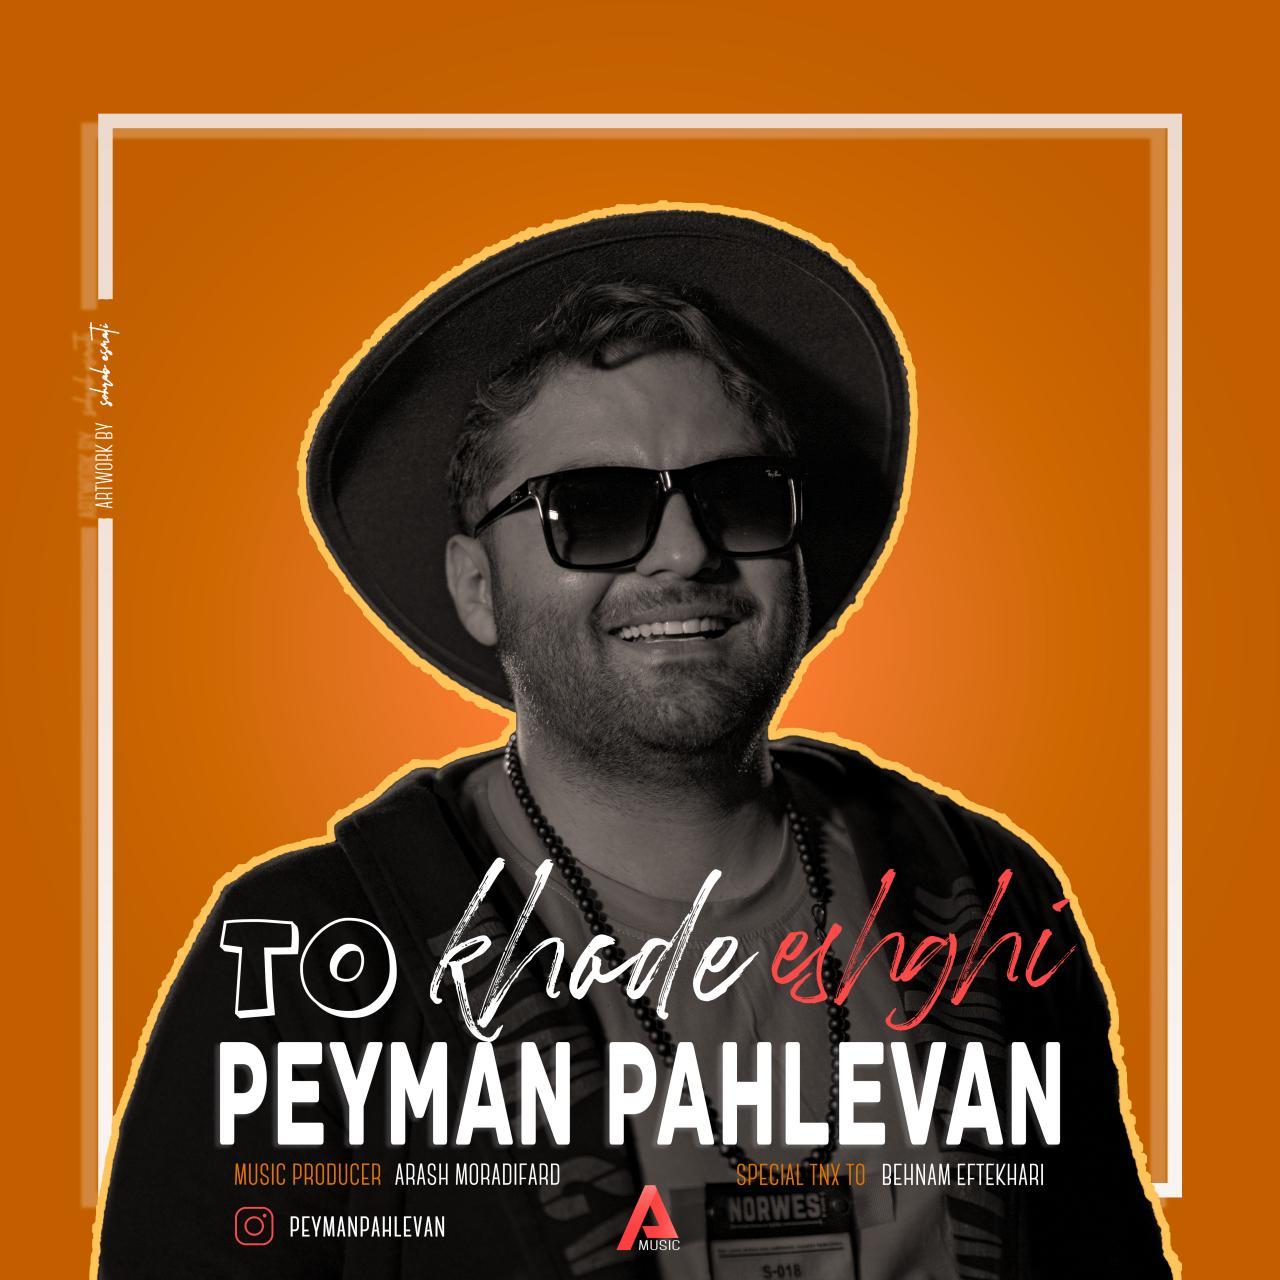 Peyman Pahlevan – To Khode Eshghi